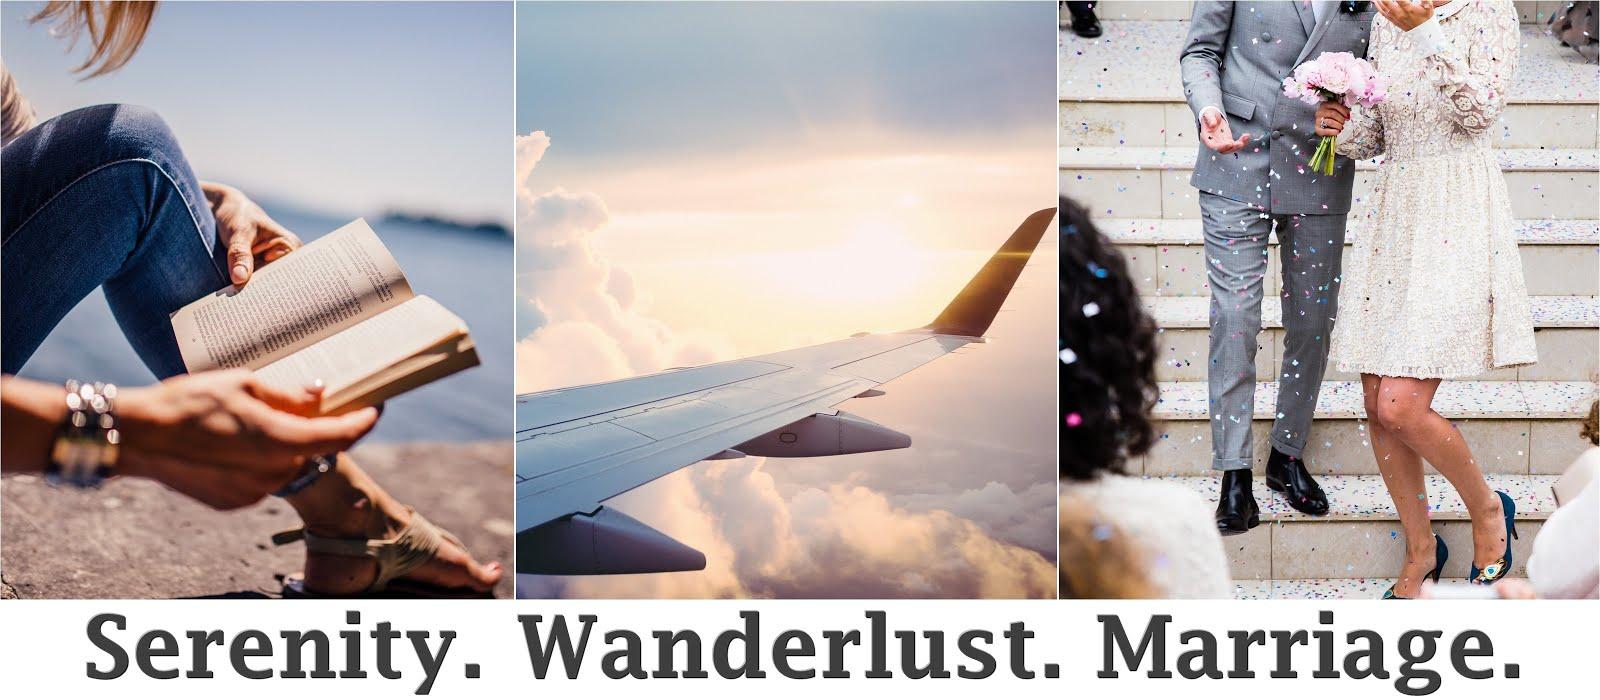 Serenity. Wanderlust. Marriage.